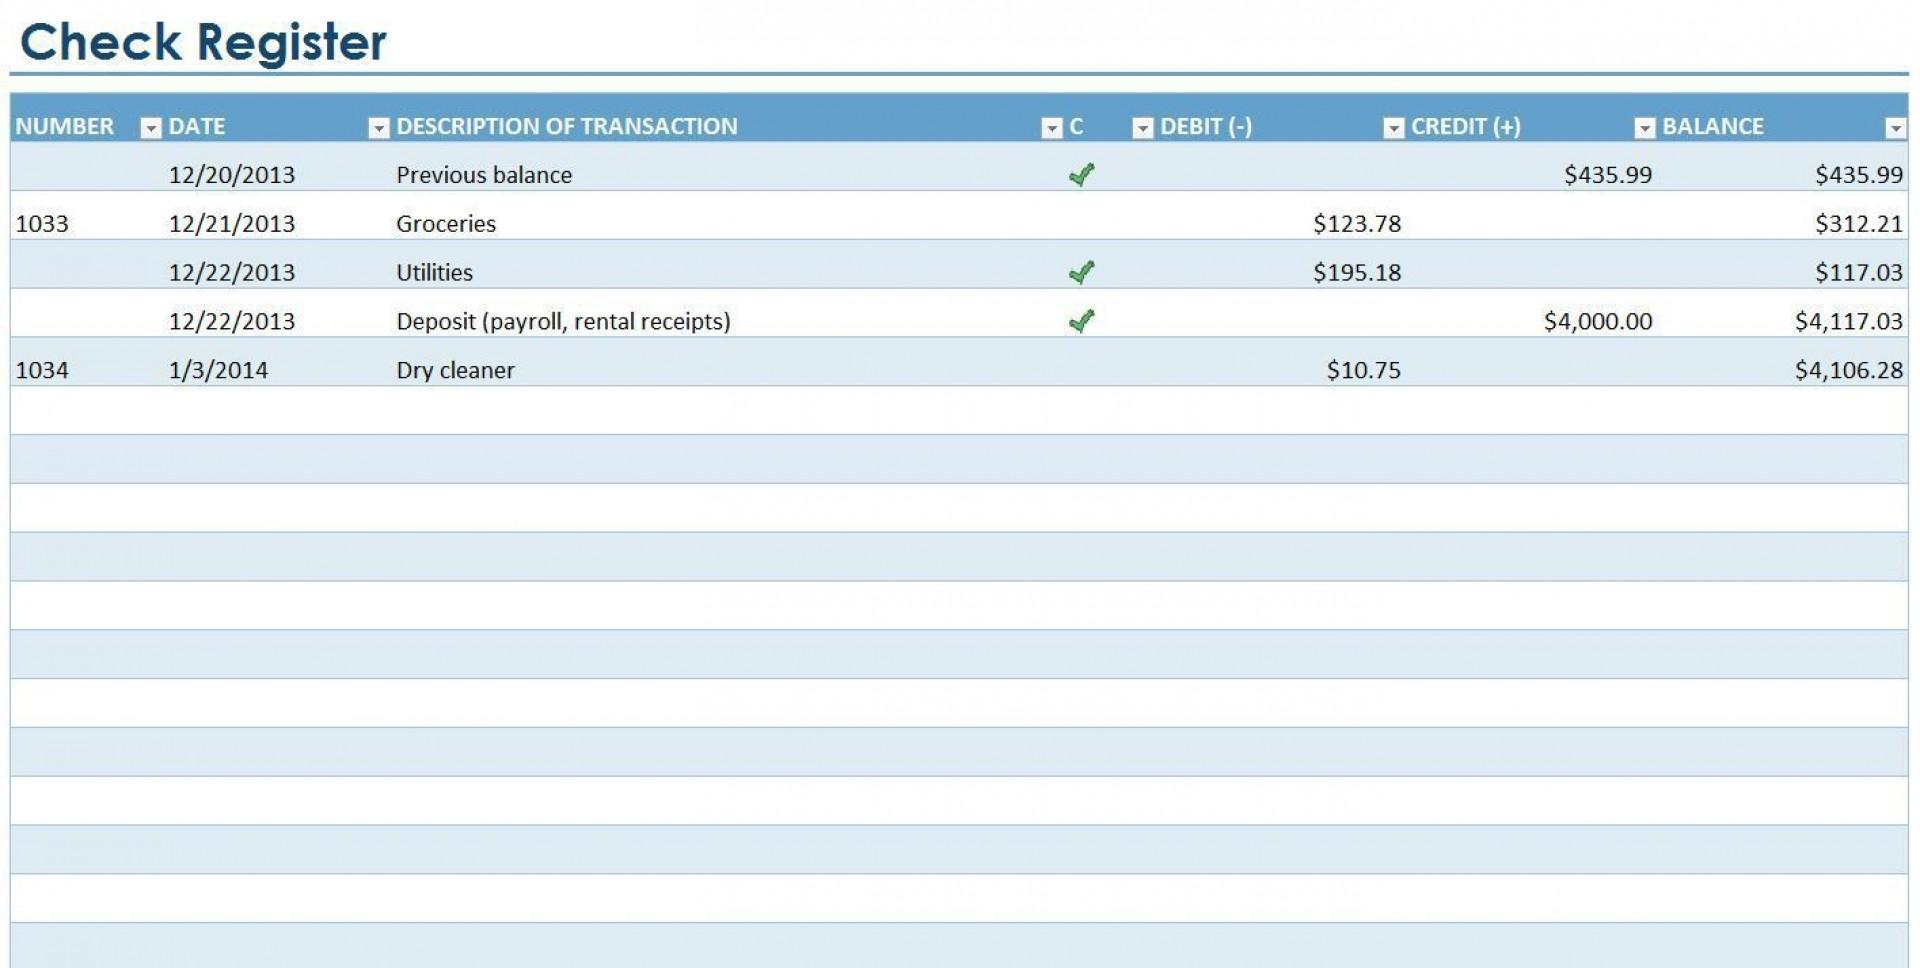 008 Stirring Checkbook Register Template Excel Image  Check 2007 Balance 20031920